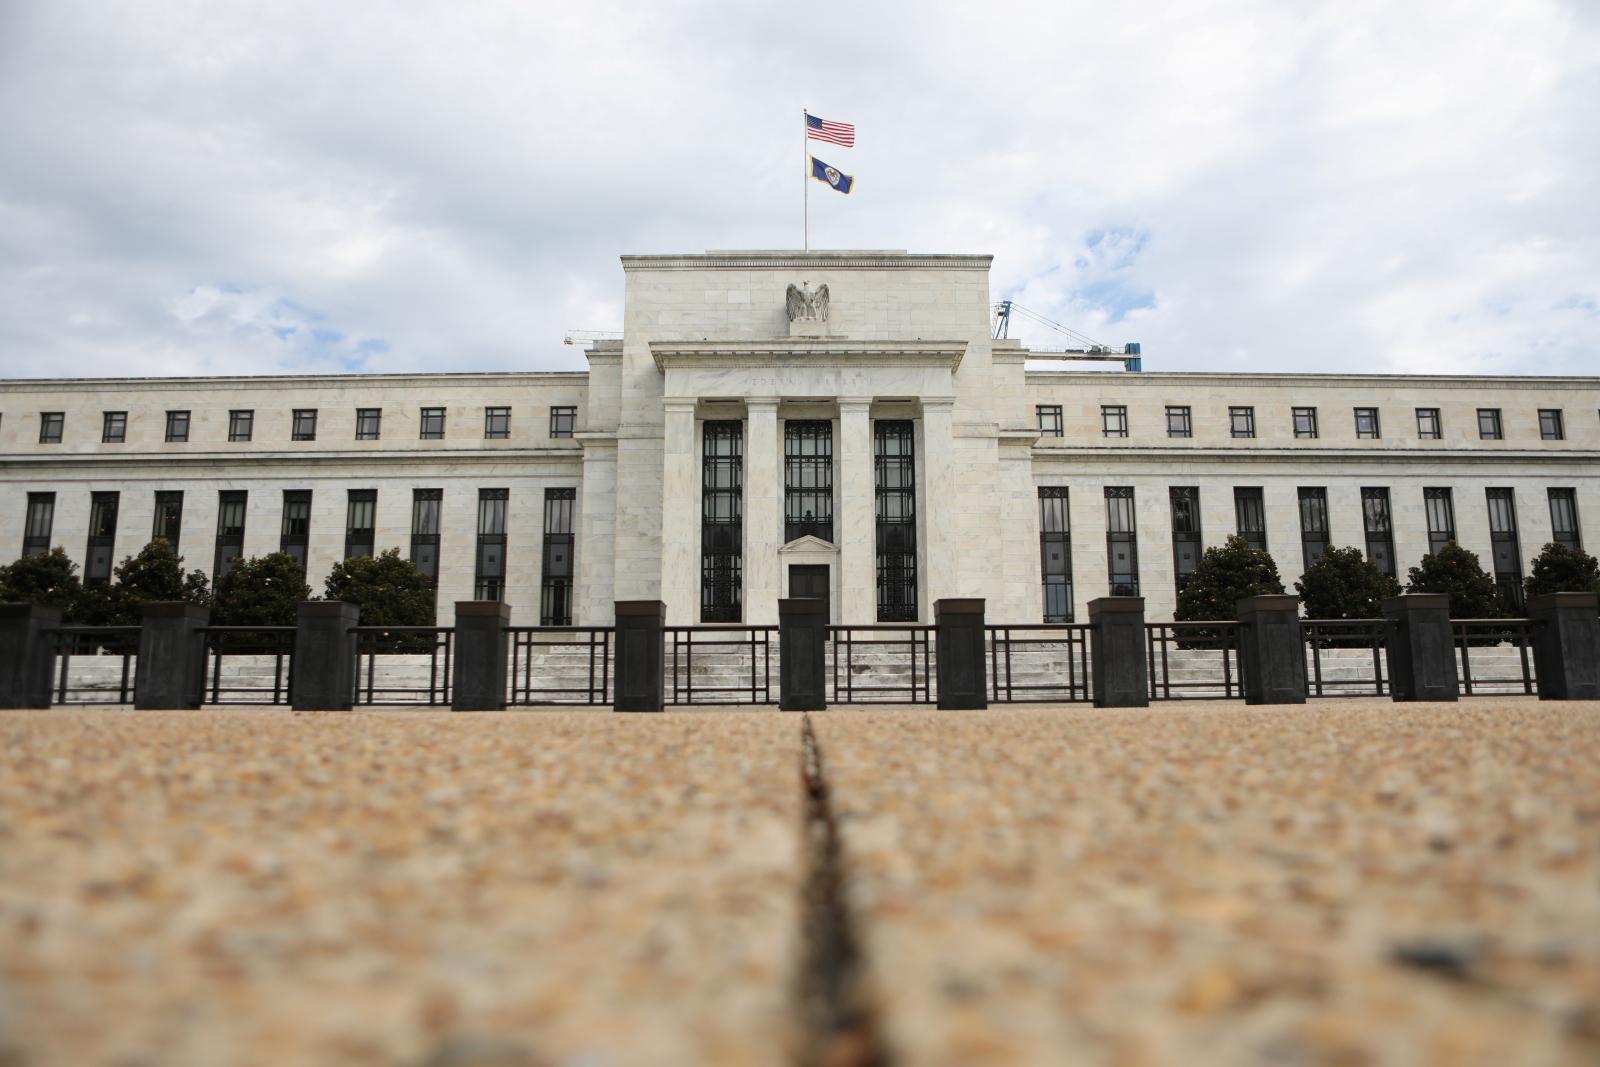 U.S Federal Reserve building